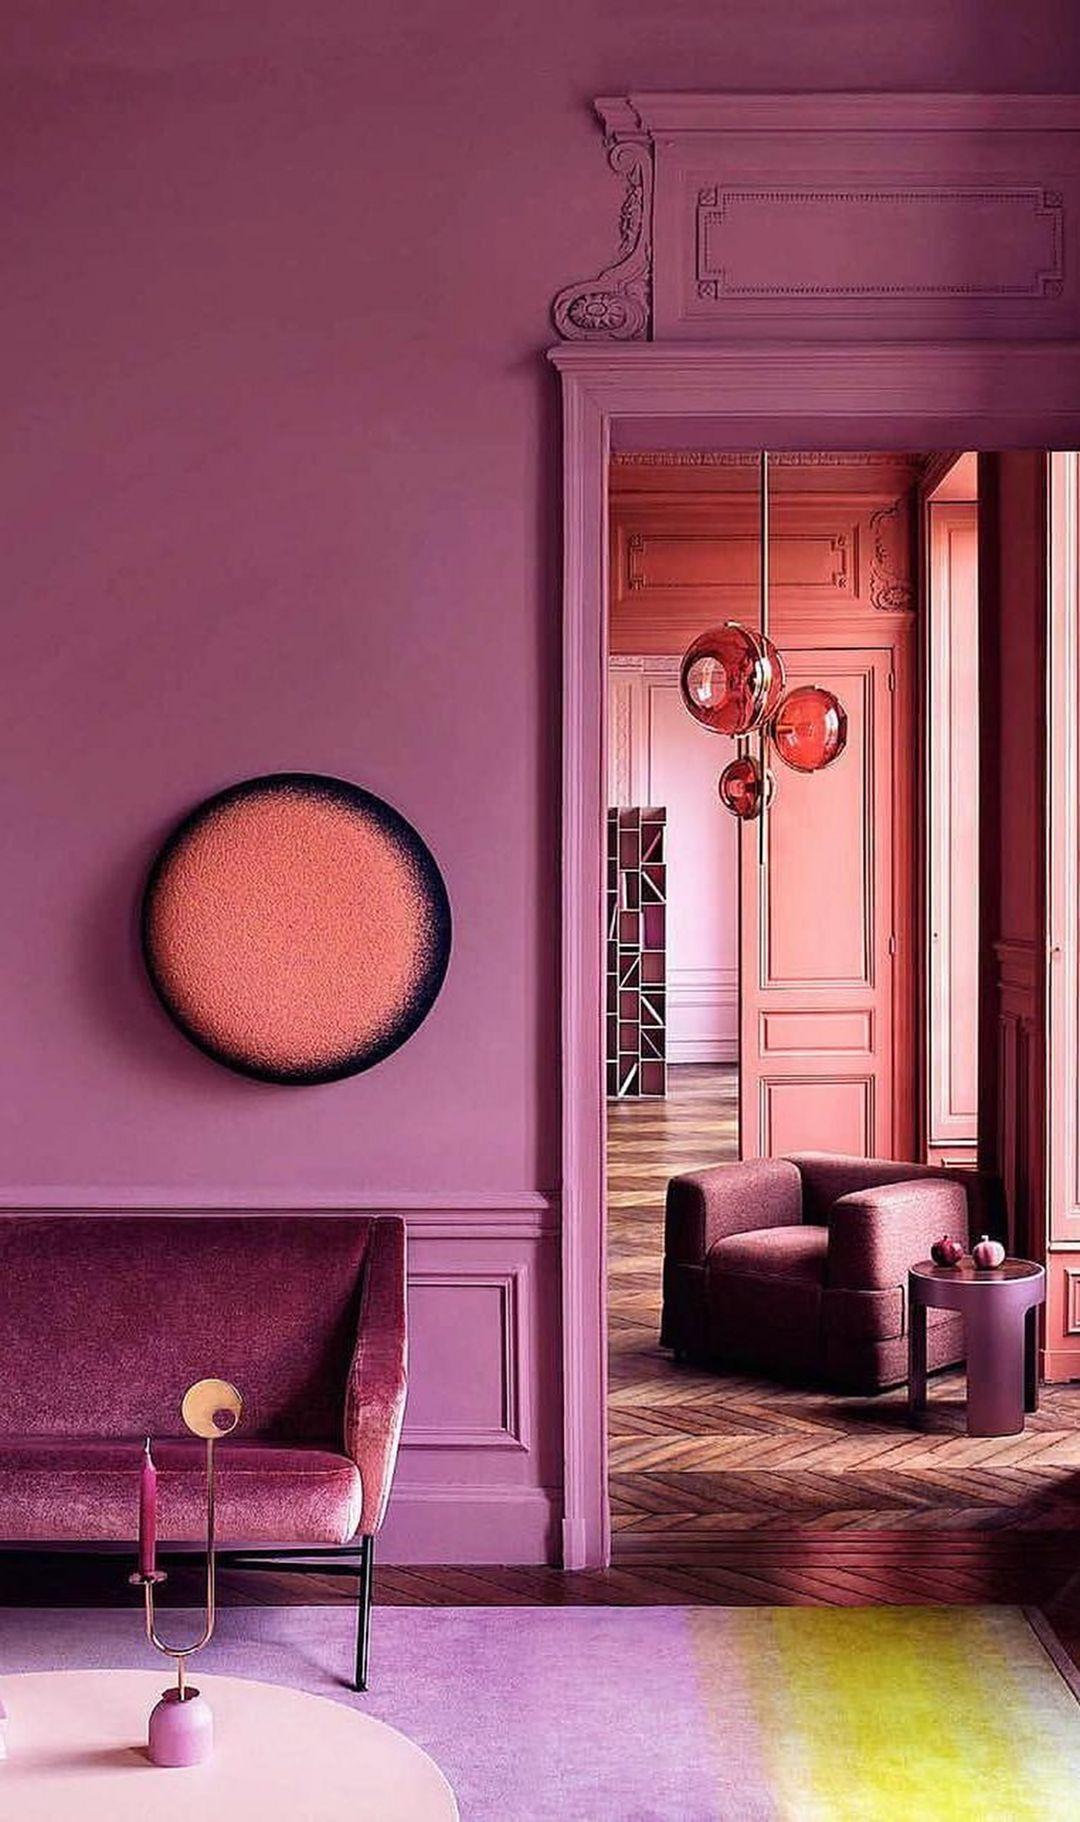 Home Interior Design Game Online: 20+ Color Harmony Interior Design Ideas For Cool Home